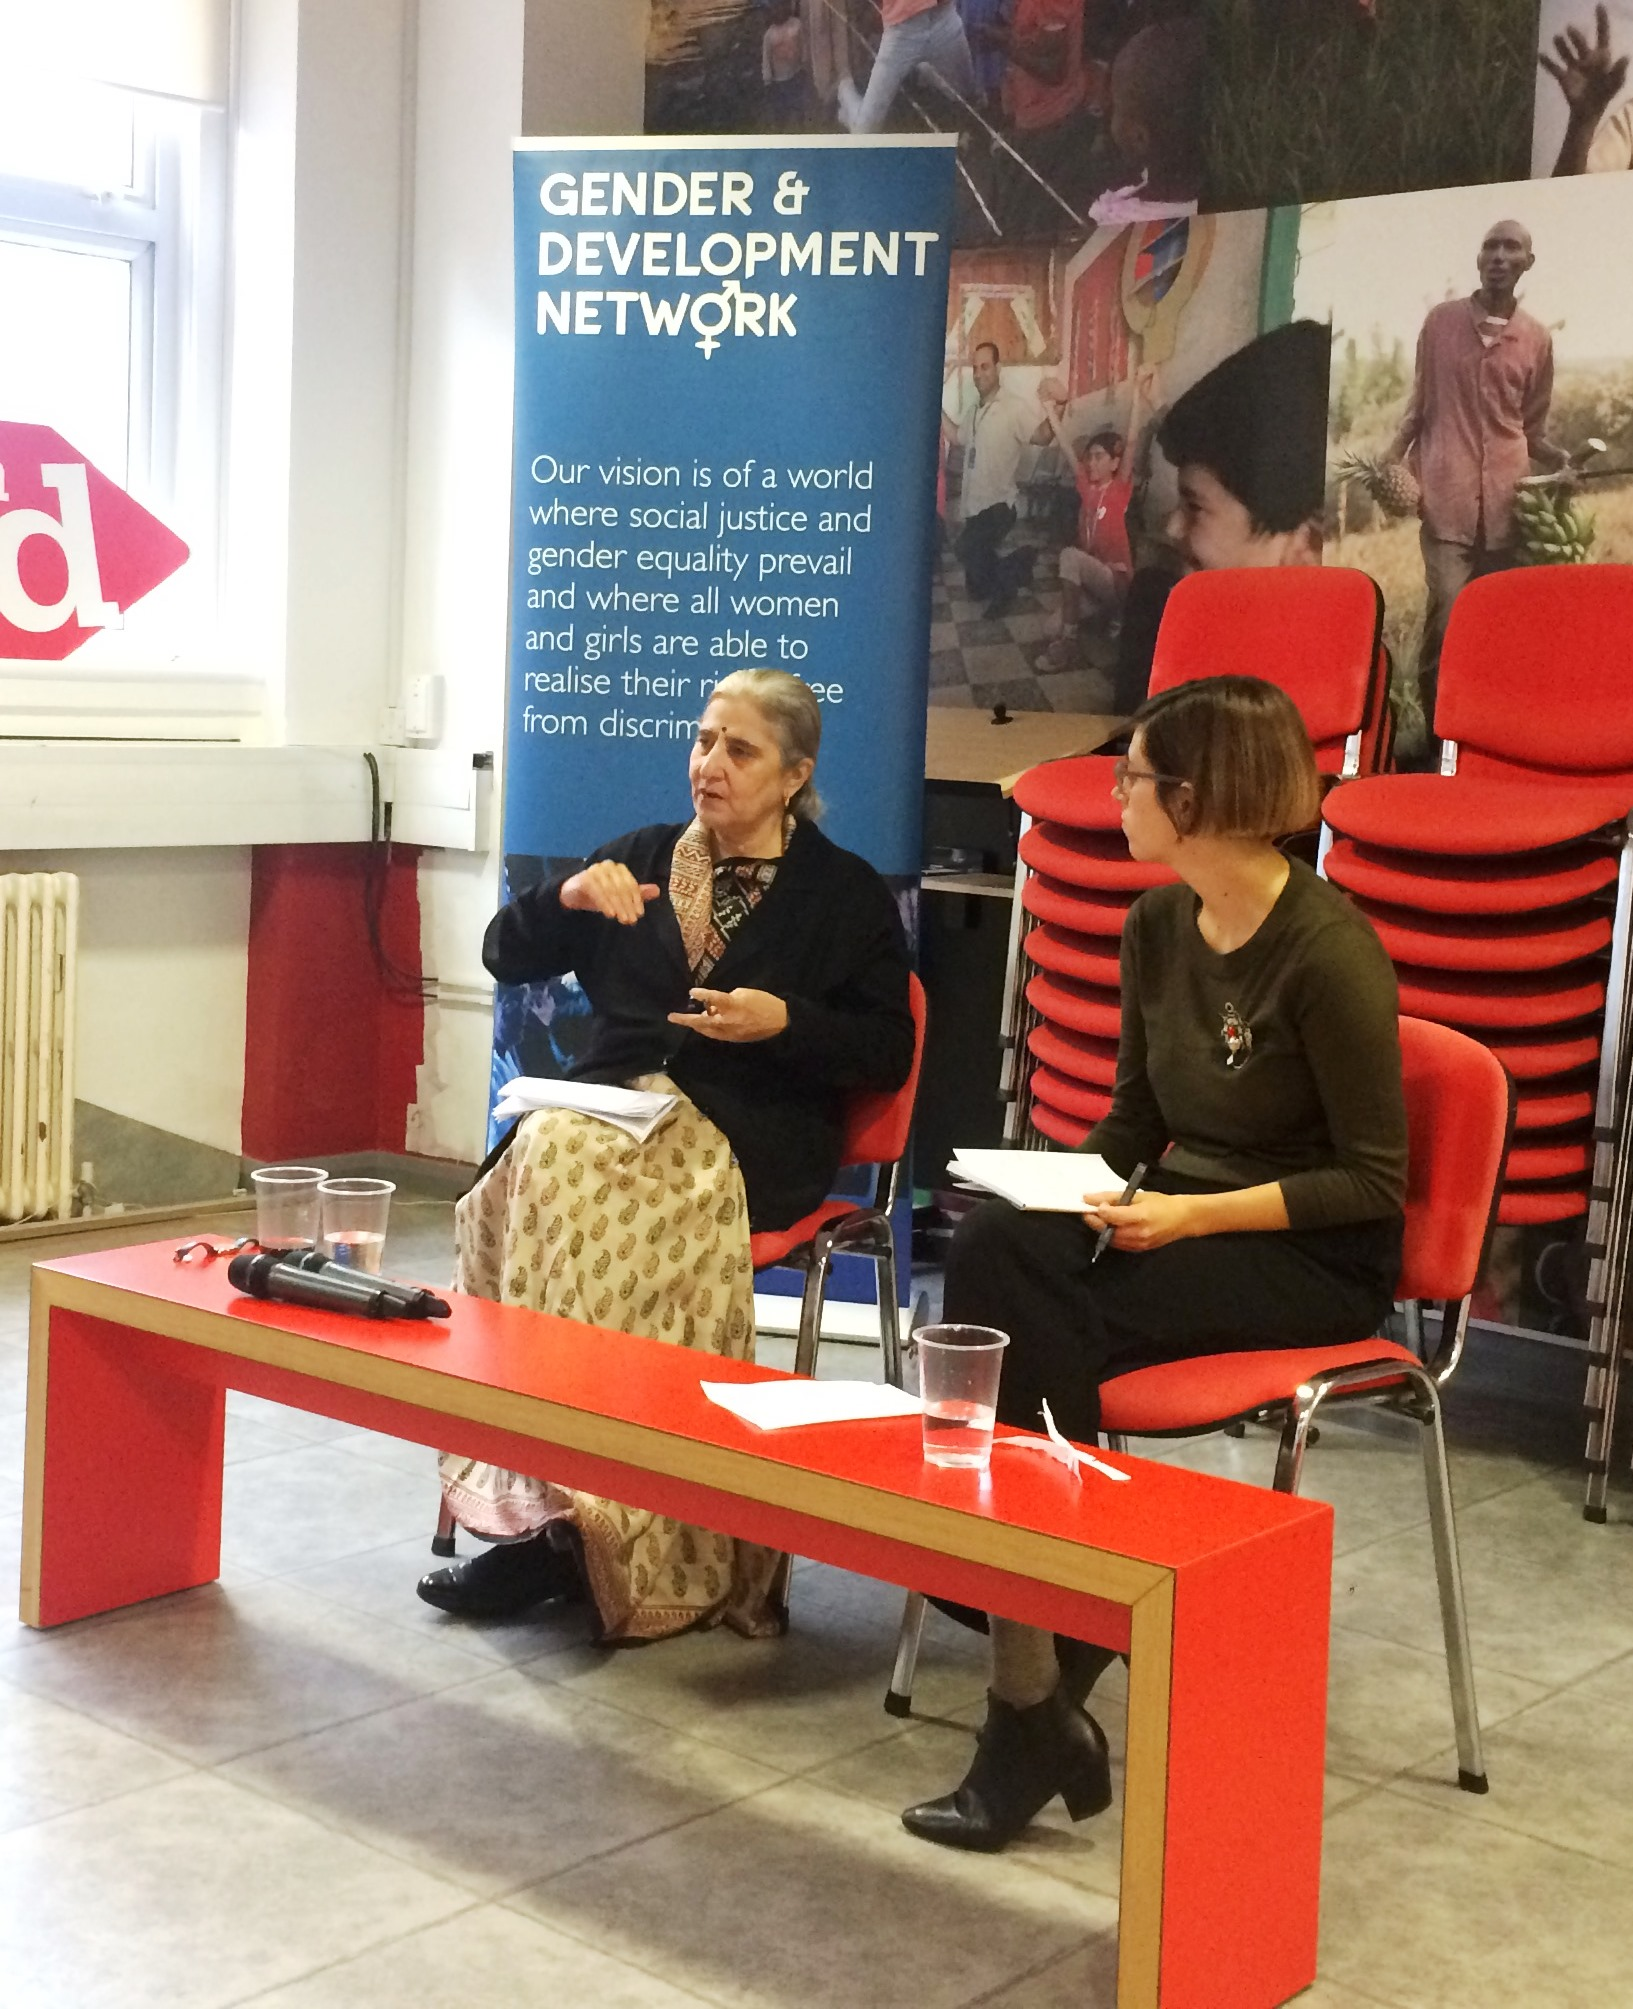 Renana Jhabvala, SEWA Bharat and WIEGO, speaks with Chiara Capraro and other GADN members, June 2017